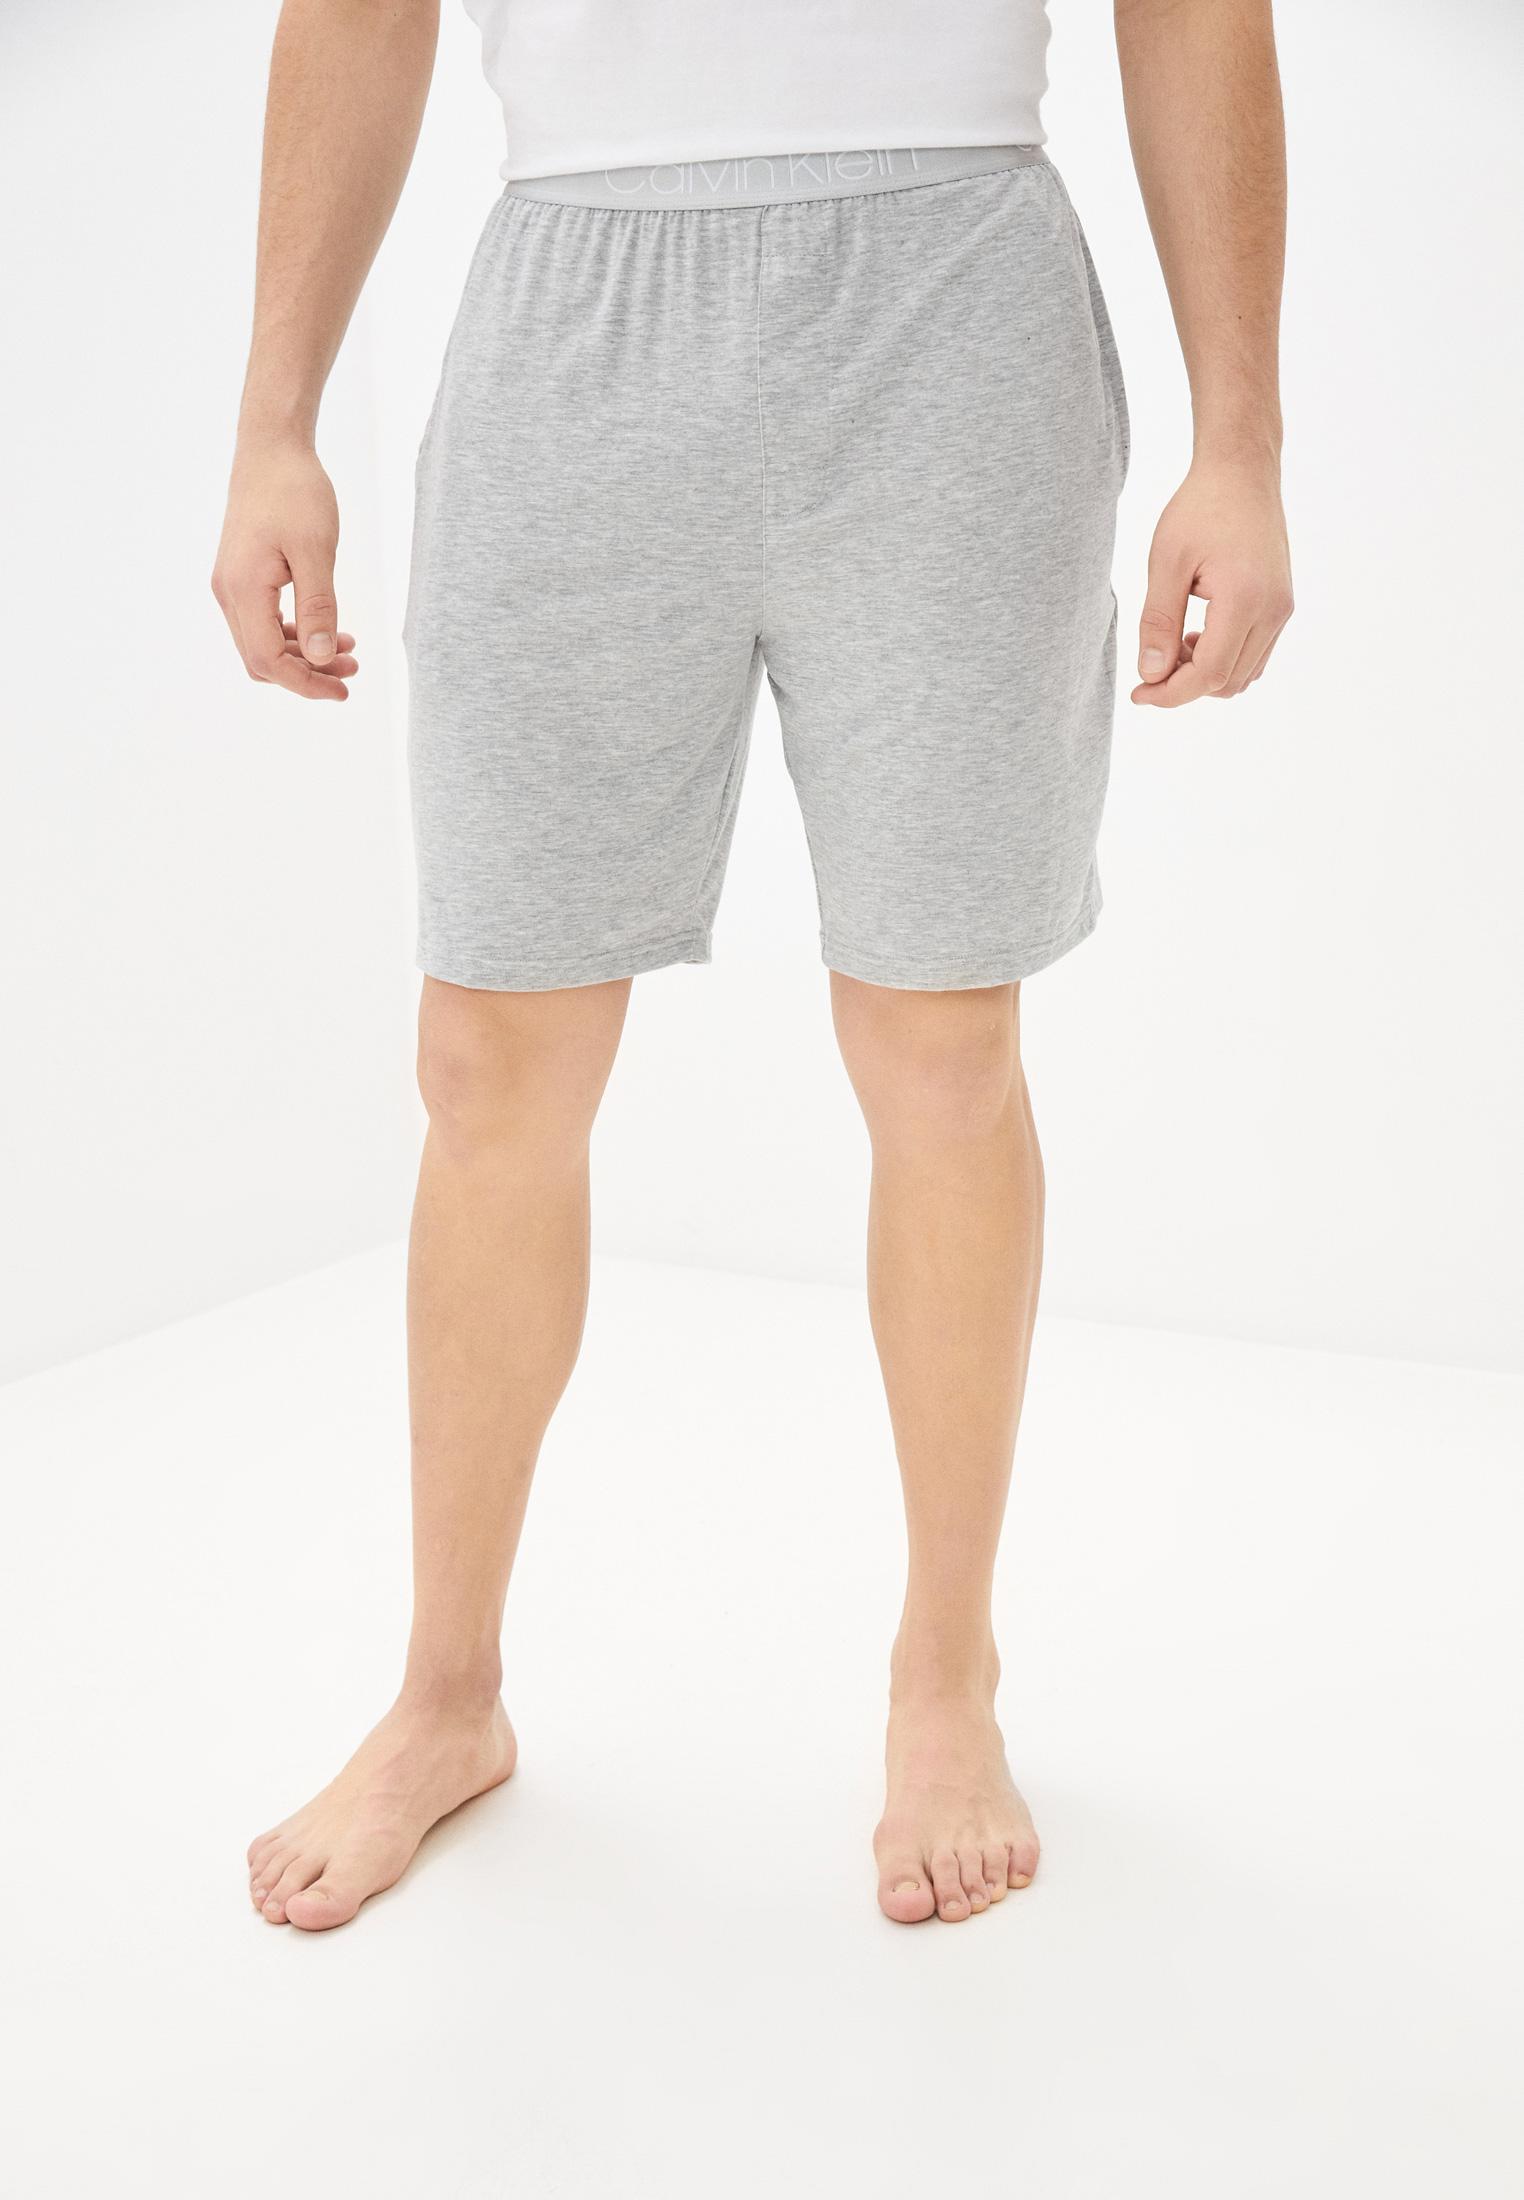 Мужские домашние брюки Calvin Klein Underwear (Кельвин Кляйн Андервеар) NM1660E